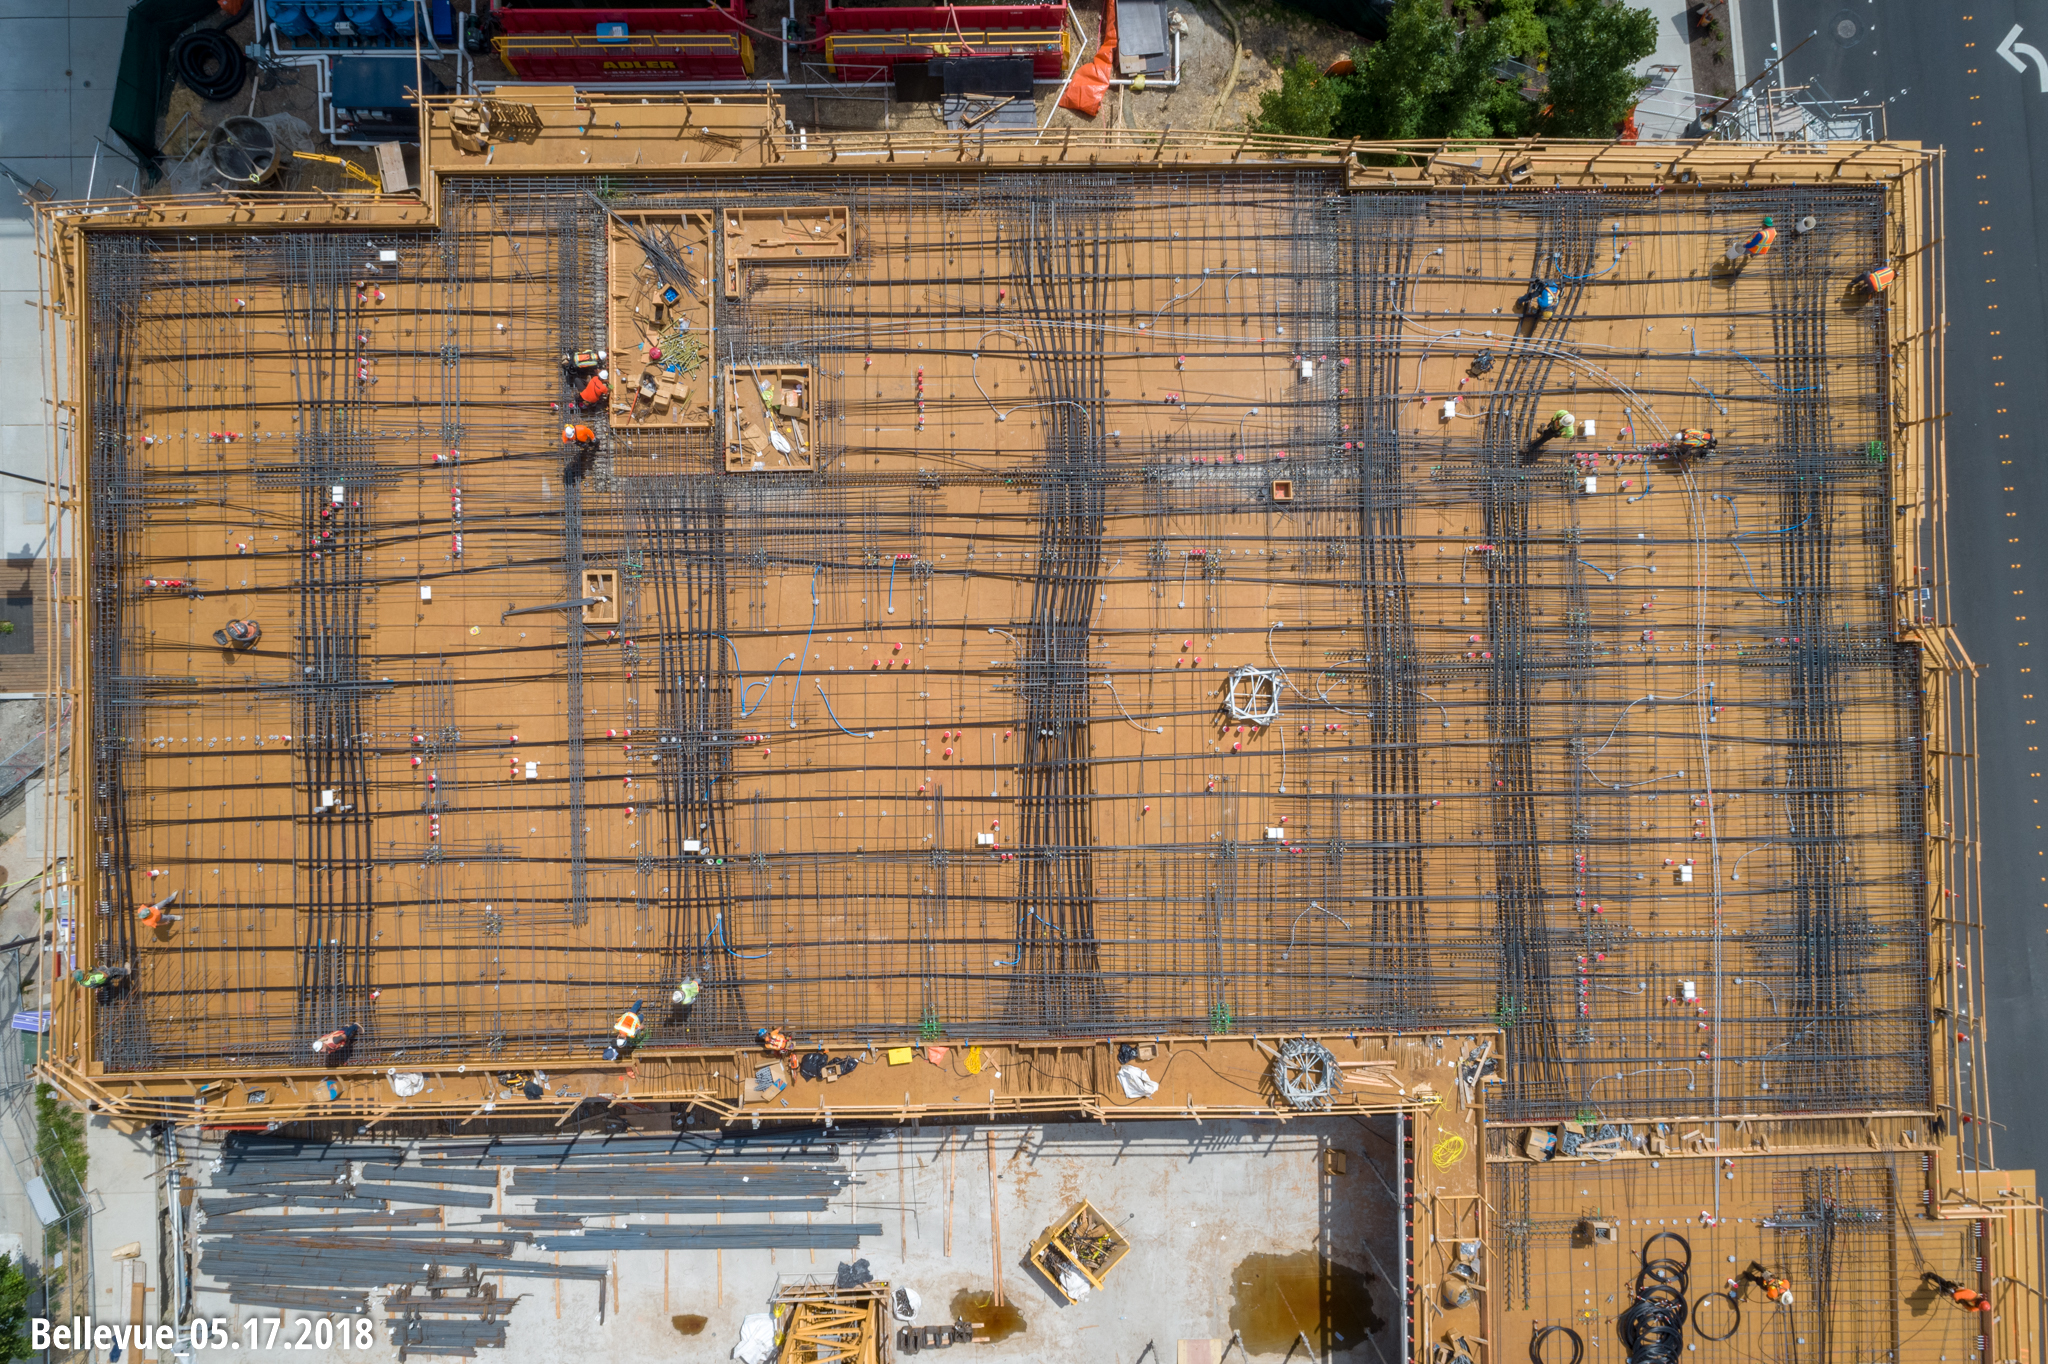 Kyle Ventle_NorthWest Drone Works_Bellevue WA Construction Aerial Photography-12.jpg